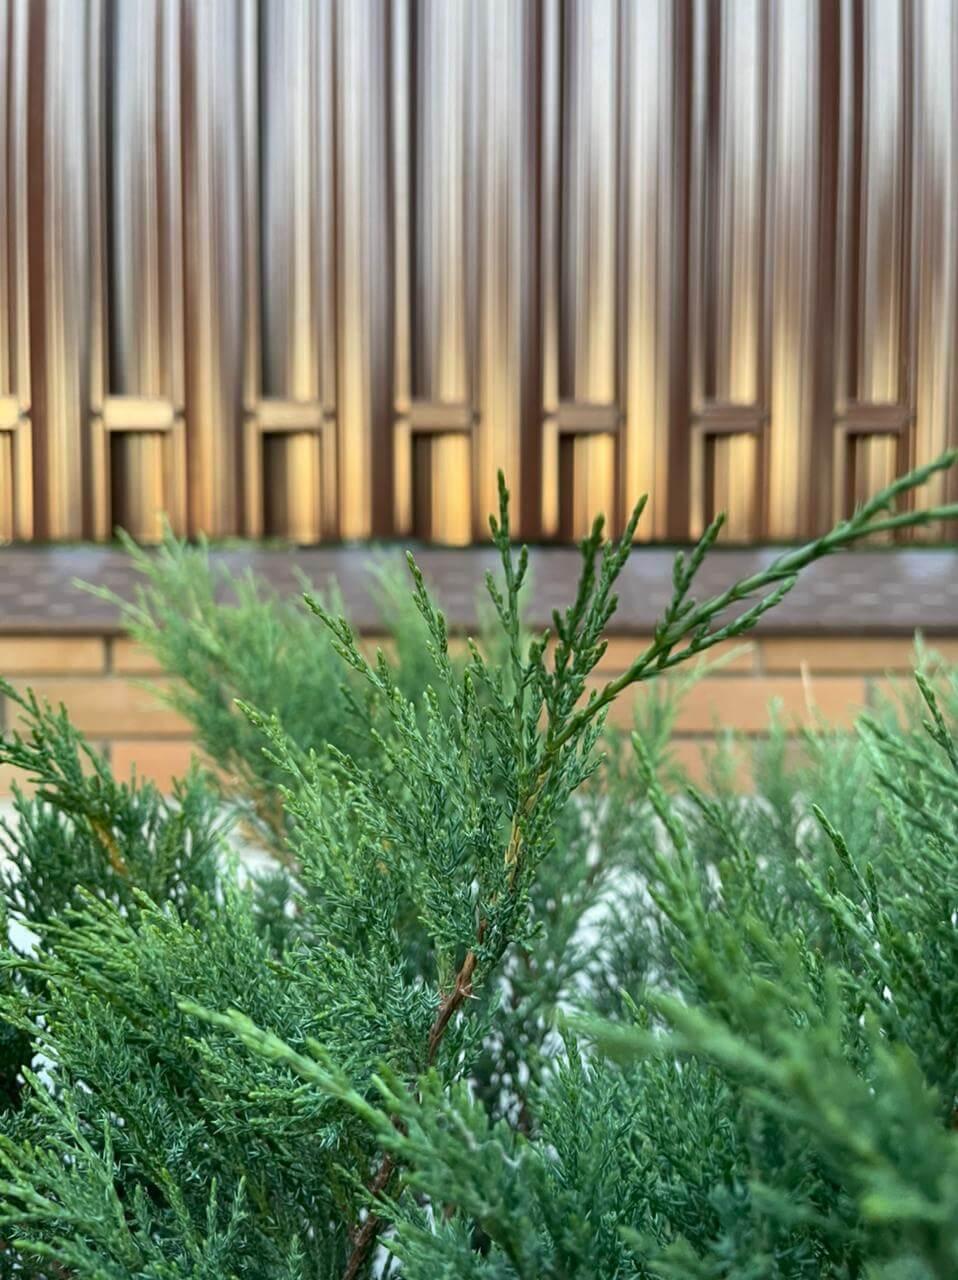 забор из штакетника шоколад двухсторонний фото5